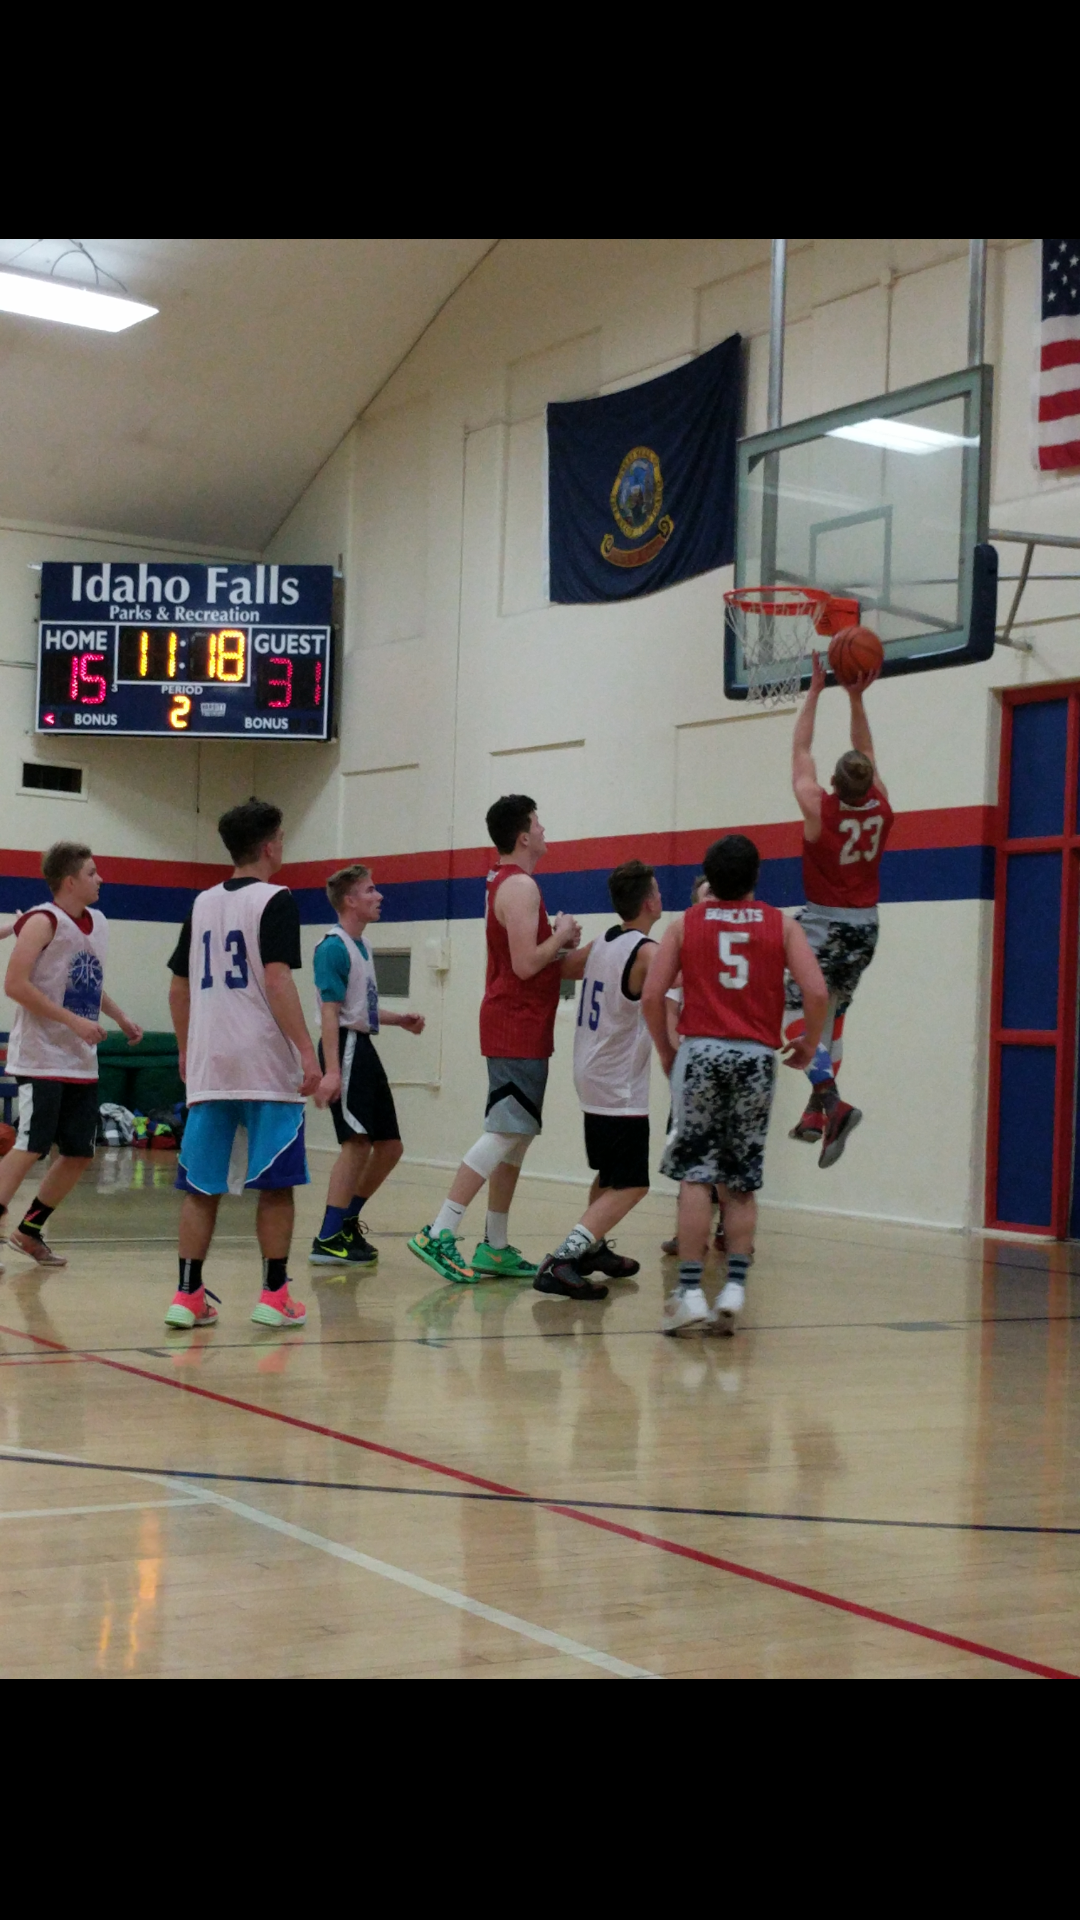 maguire-madison-maniacs-demolish-hillcrest-in-recreational-basketball-showdown